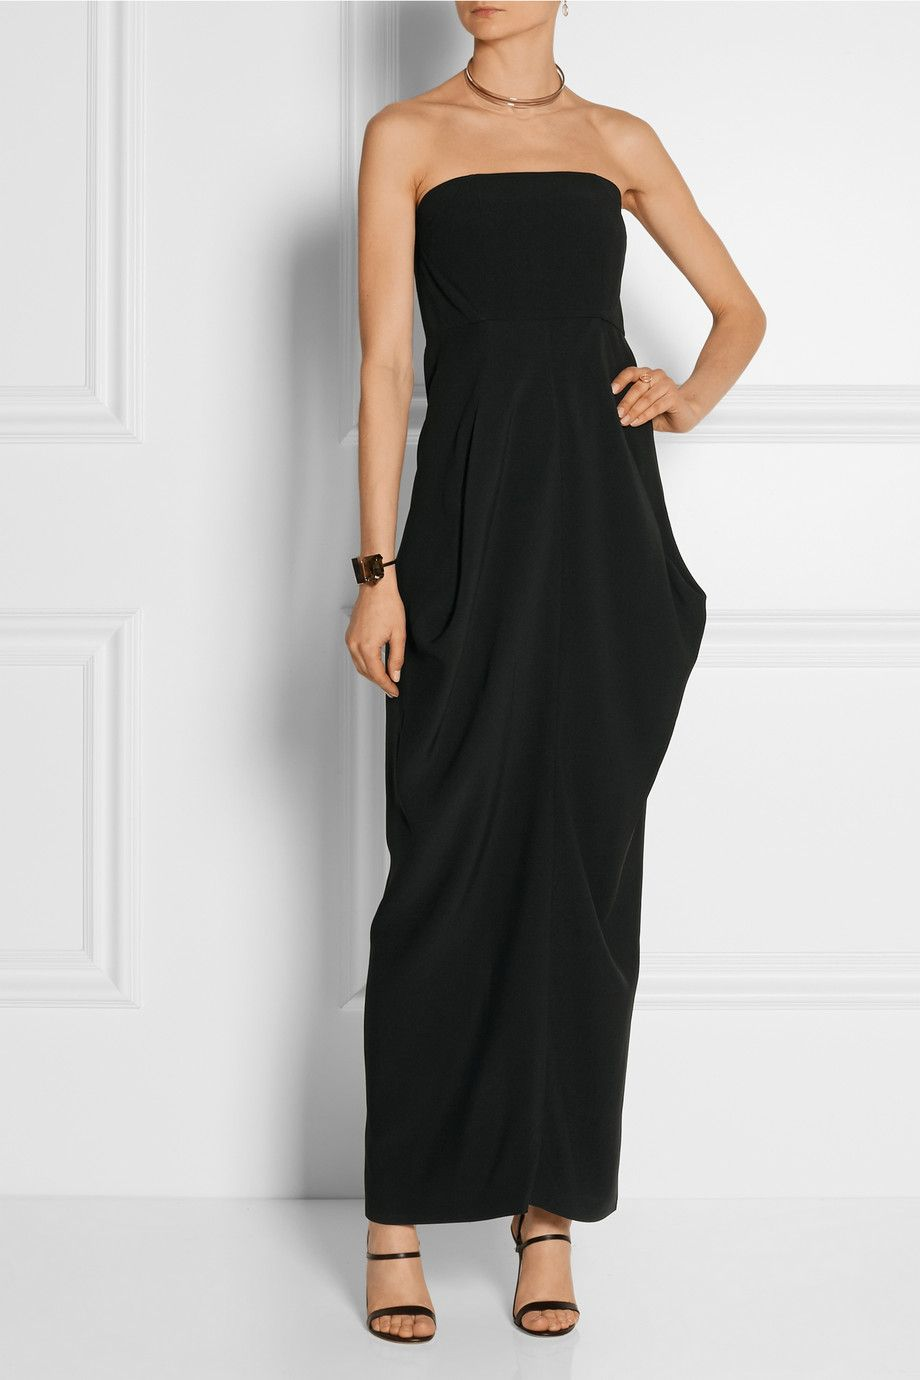 Zero+MariaCornejo|Long Anise crepe dress